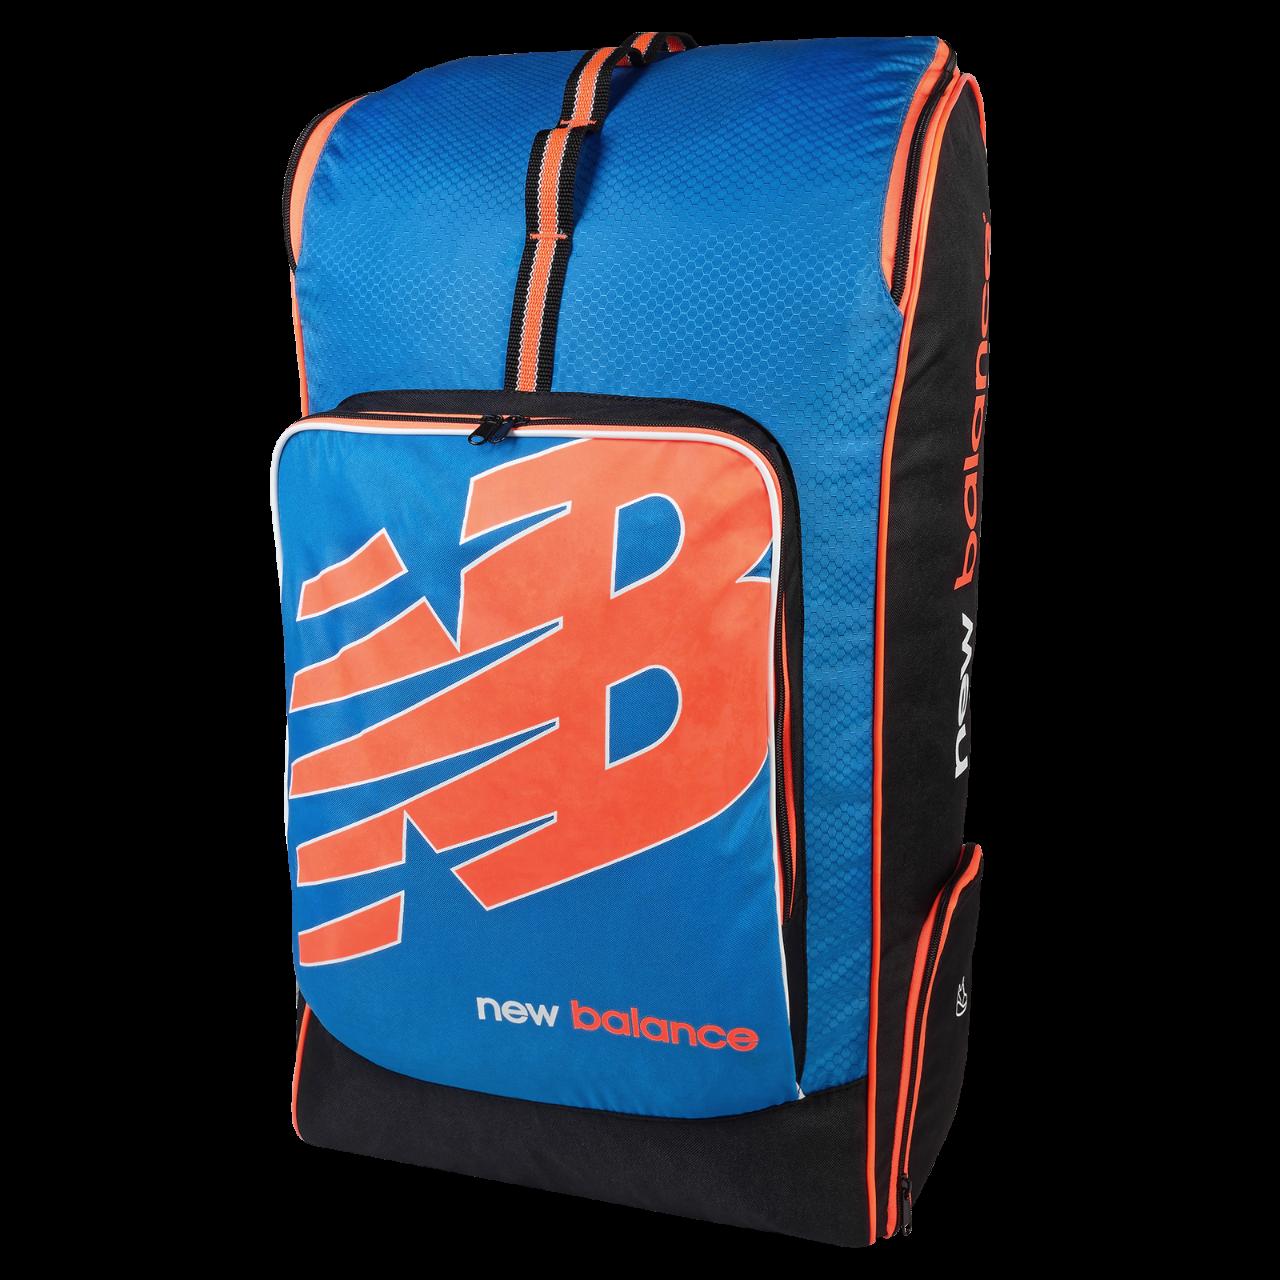 2021 New Balance DC 680 Duffle Cricket Bag